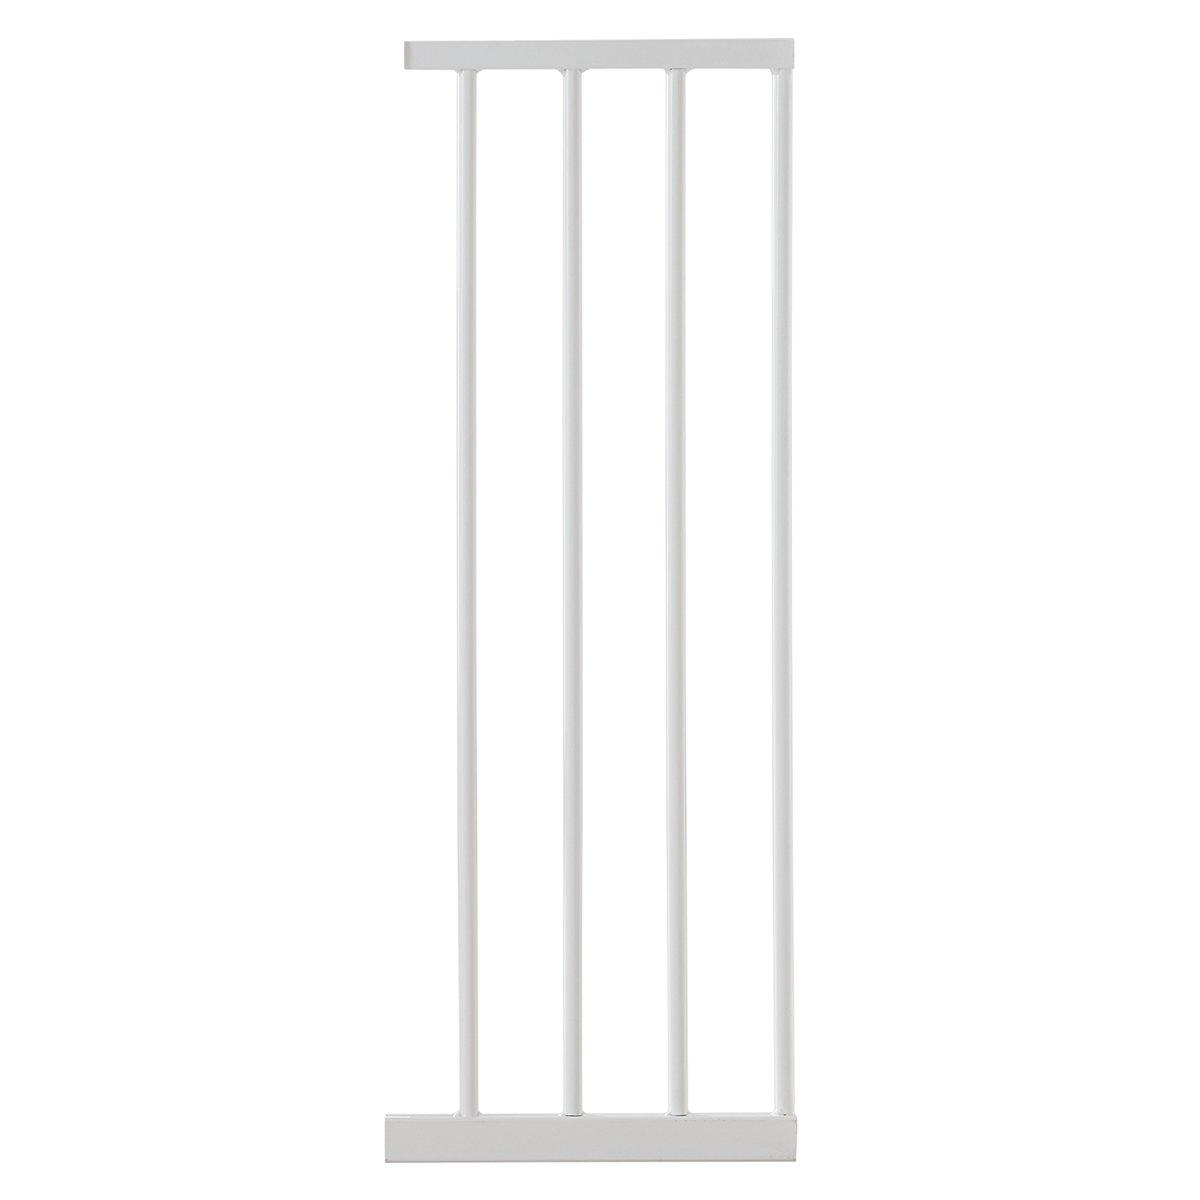 Lindam Sure Shut Orto Pressure Fit Safety Gate 96-103 cm